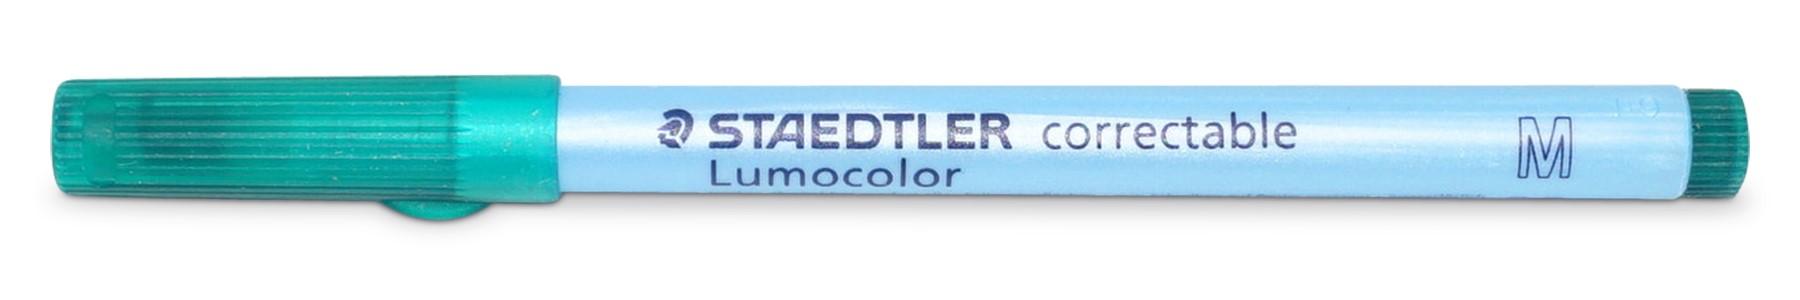 Staedtler Lumocolor correctable Folienstift